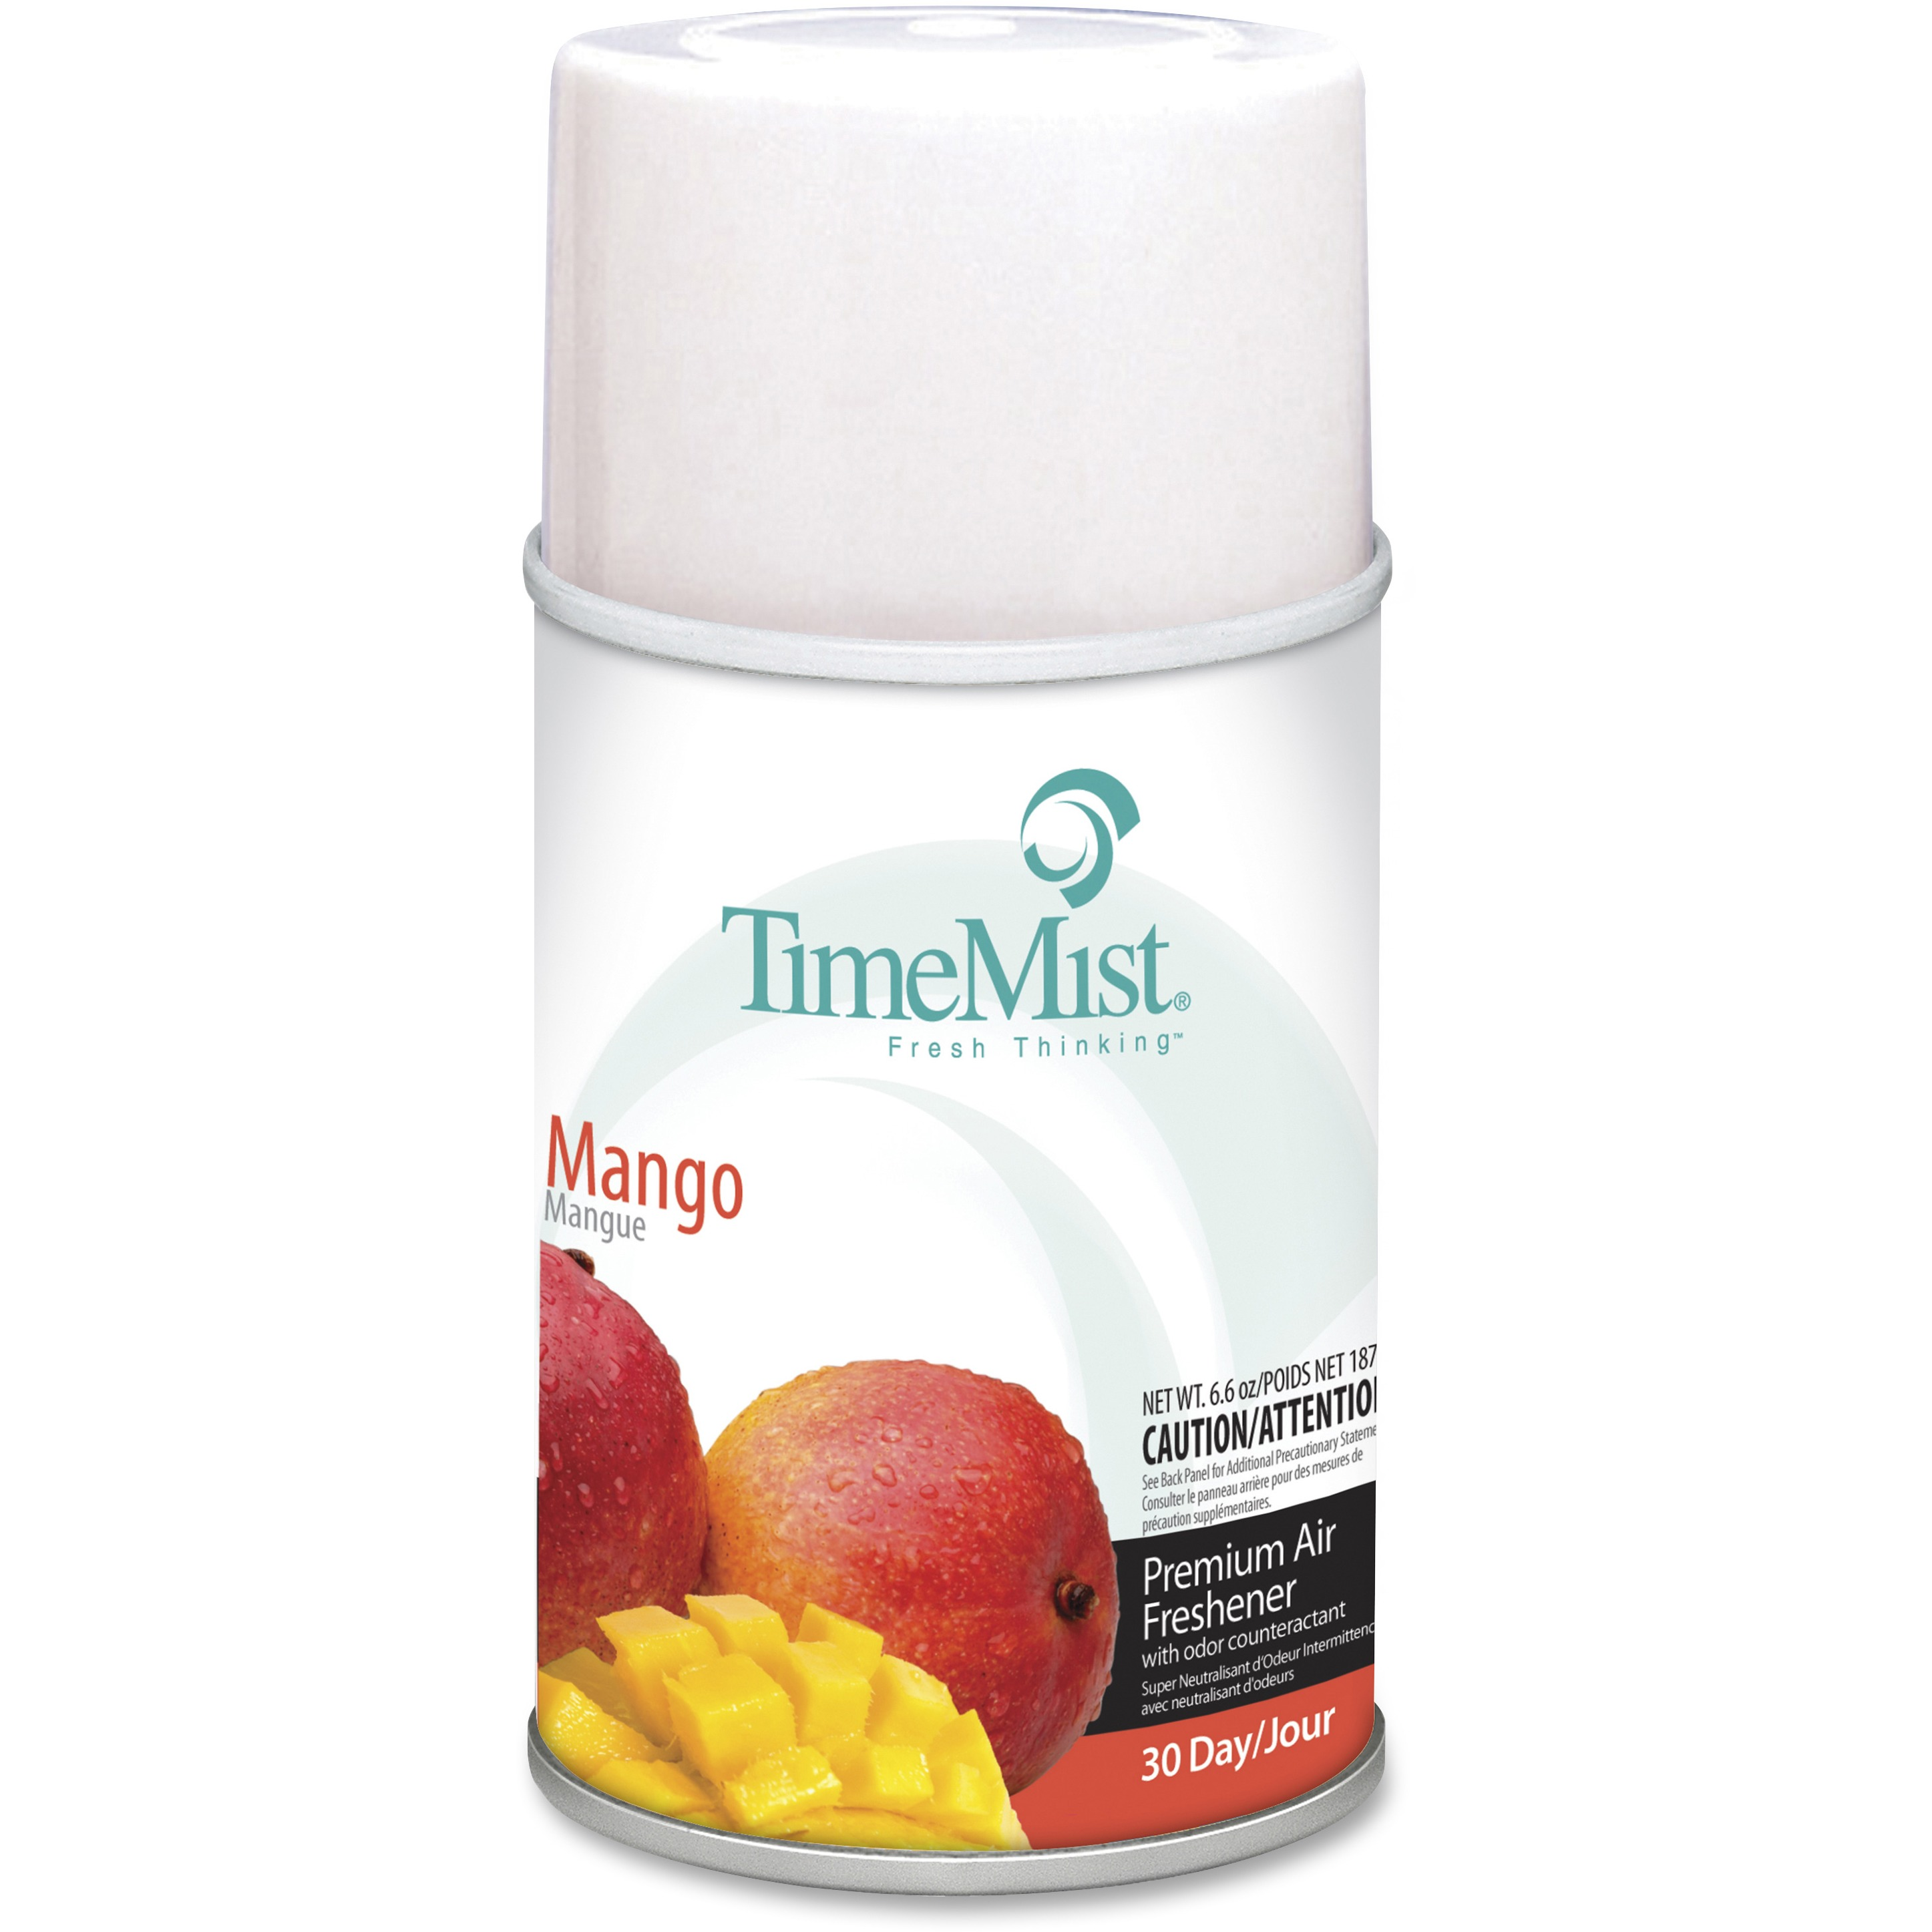 TimeMist, TMS1042810, Metered Dispenser Mango Scent Refill, 1 Each, Clear